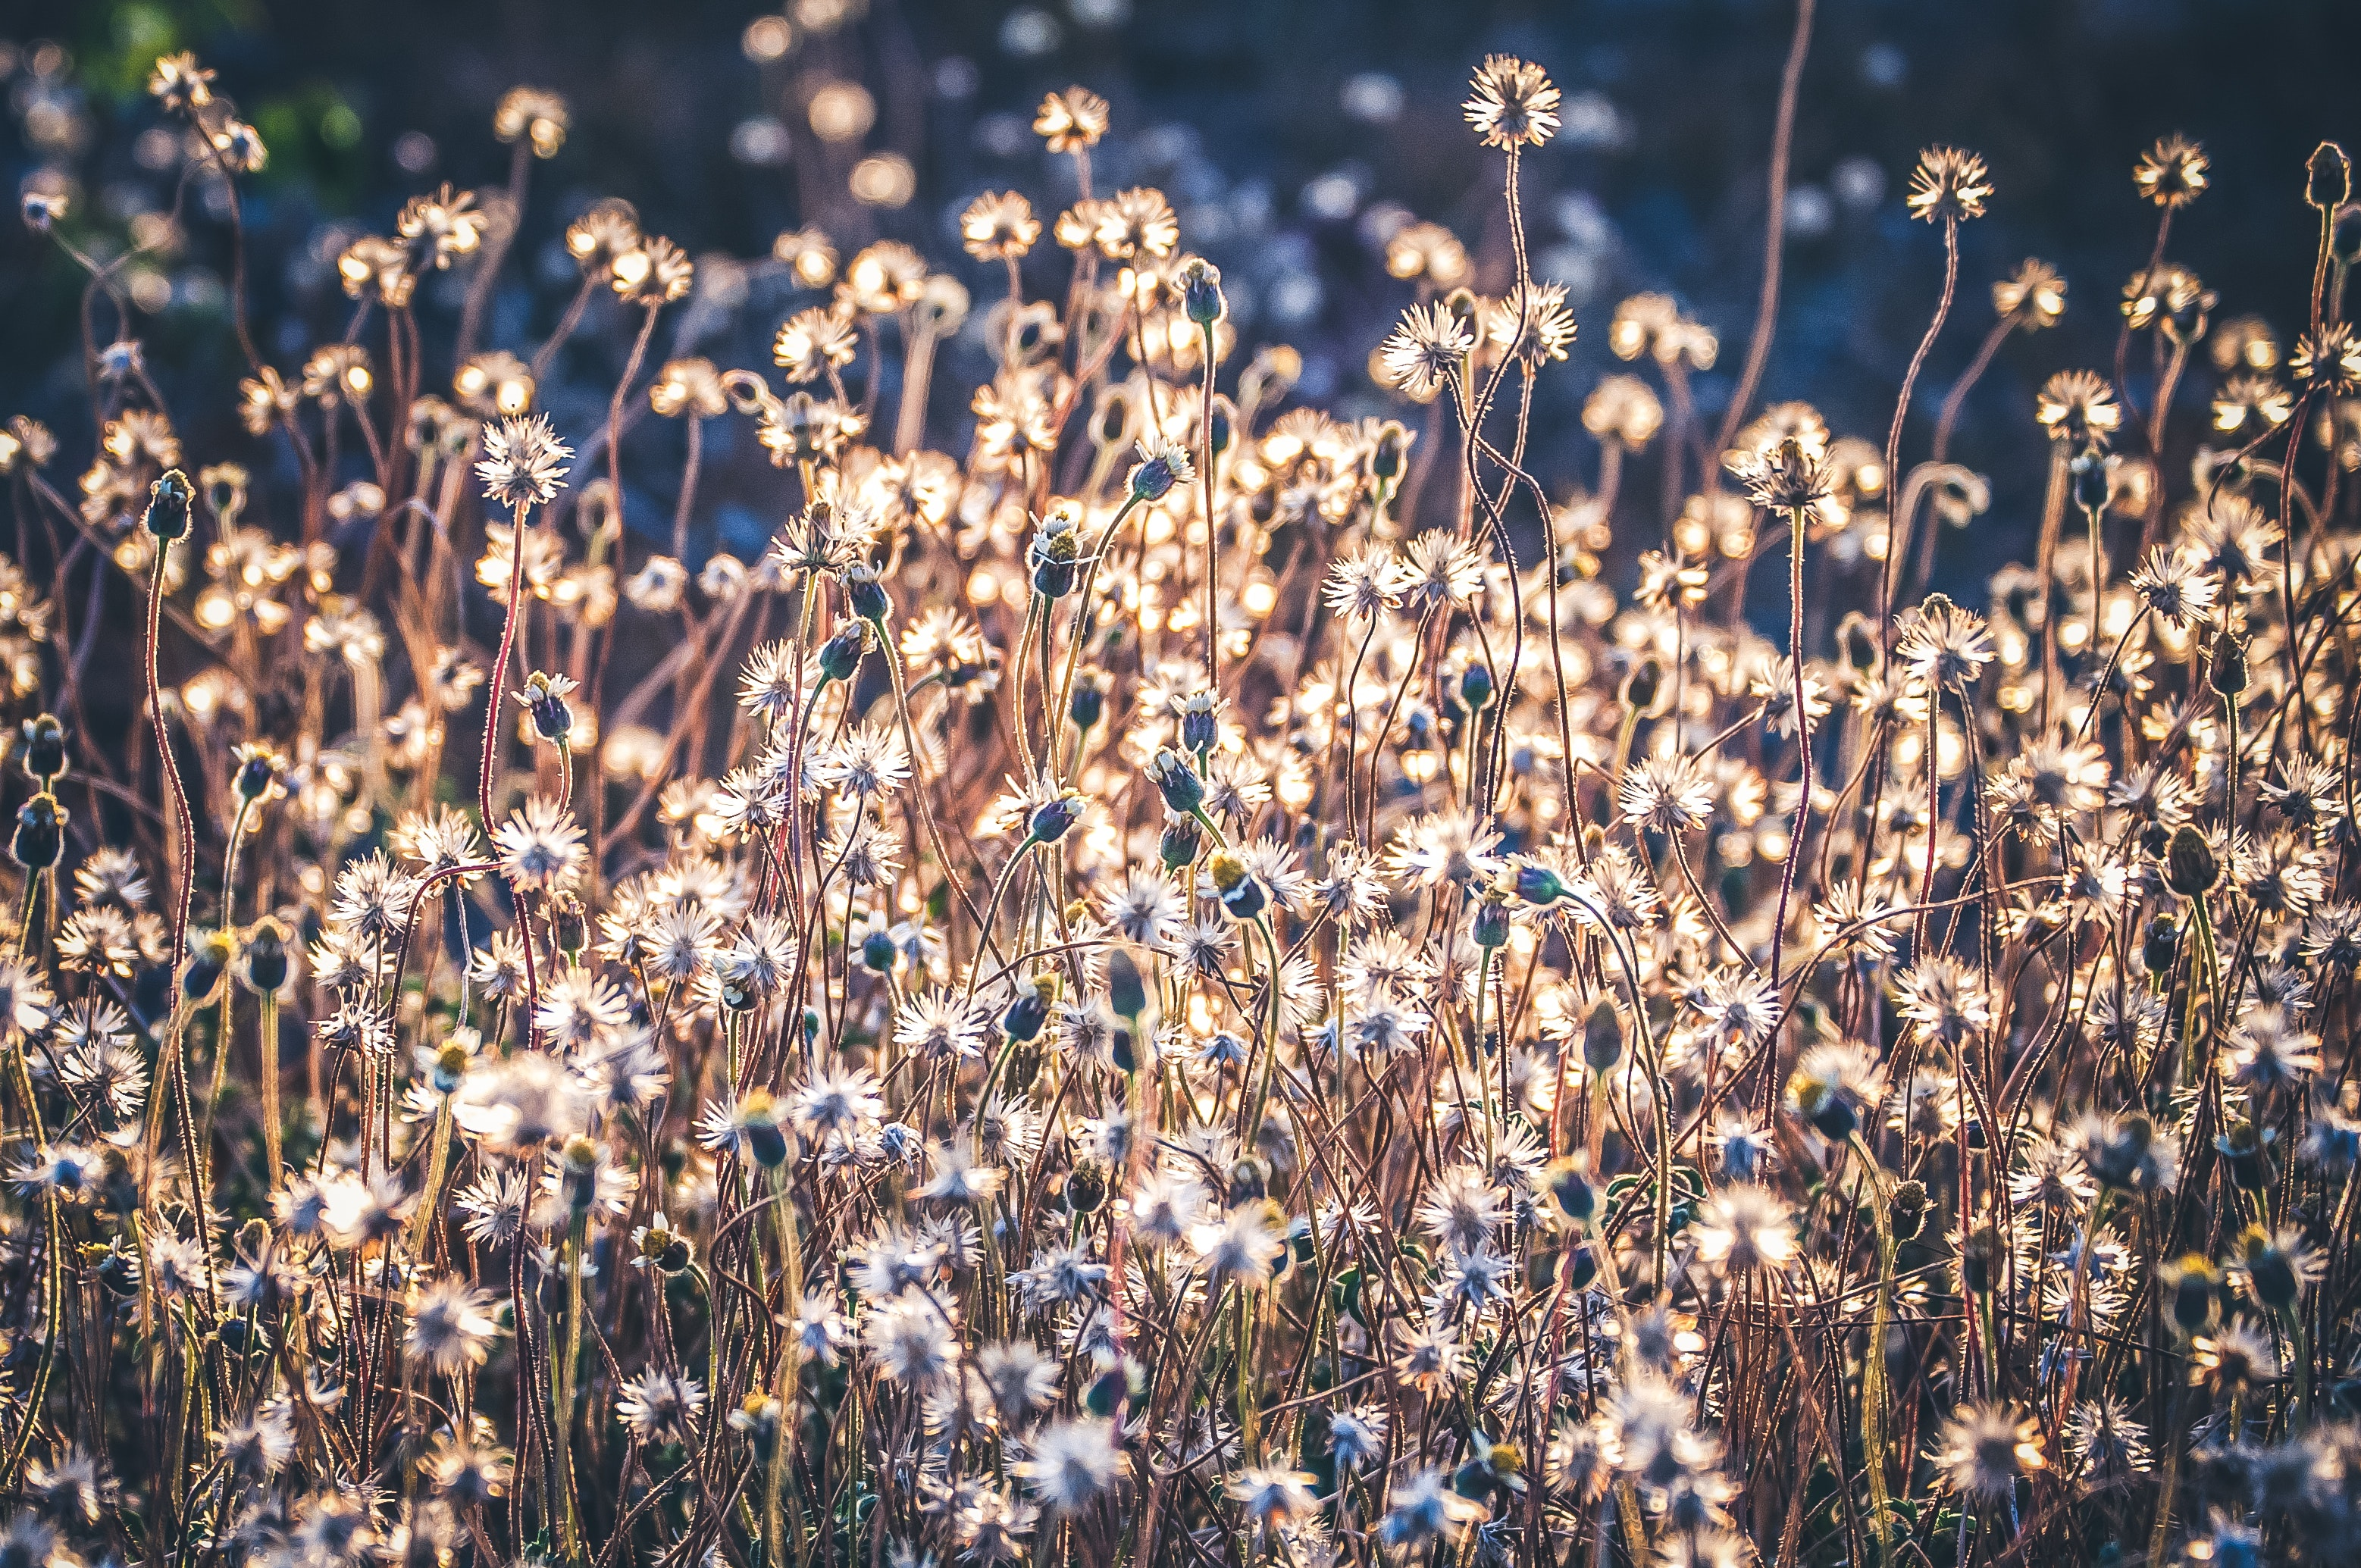 Flowerbed photo